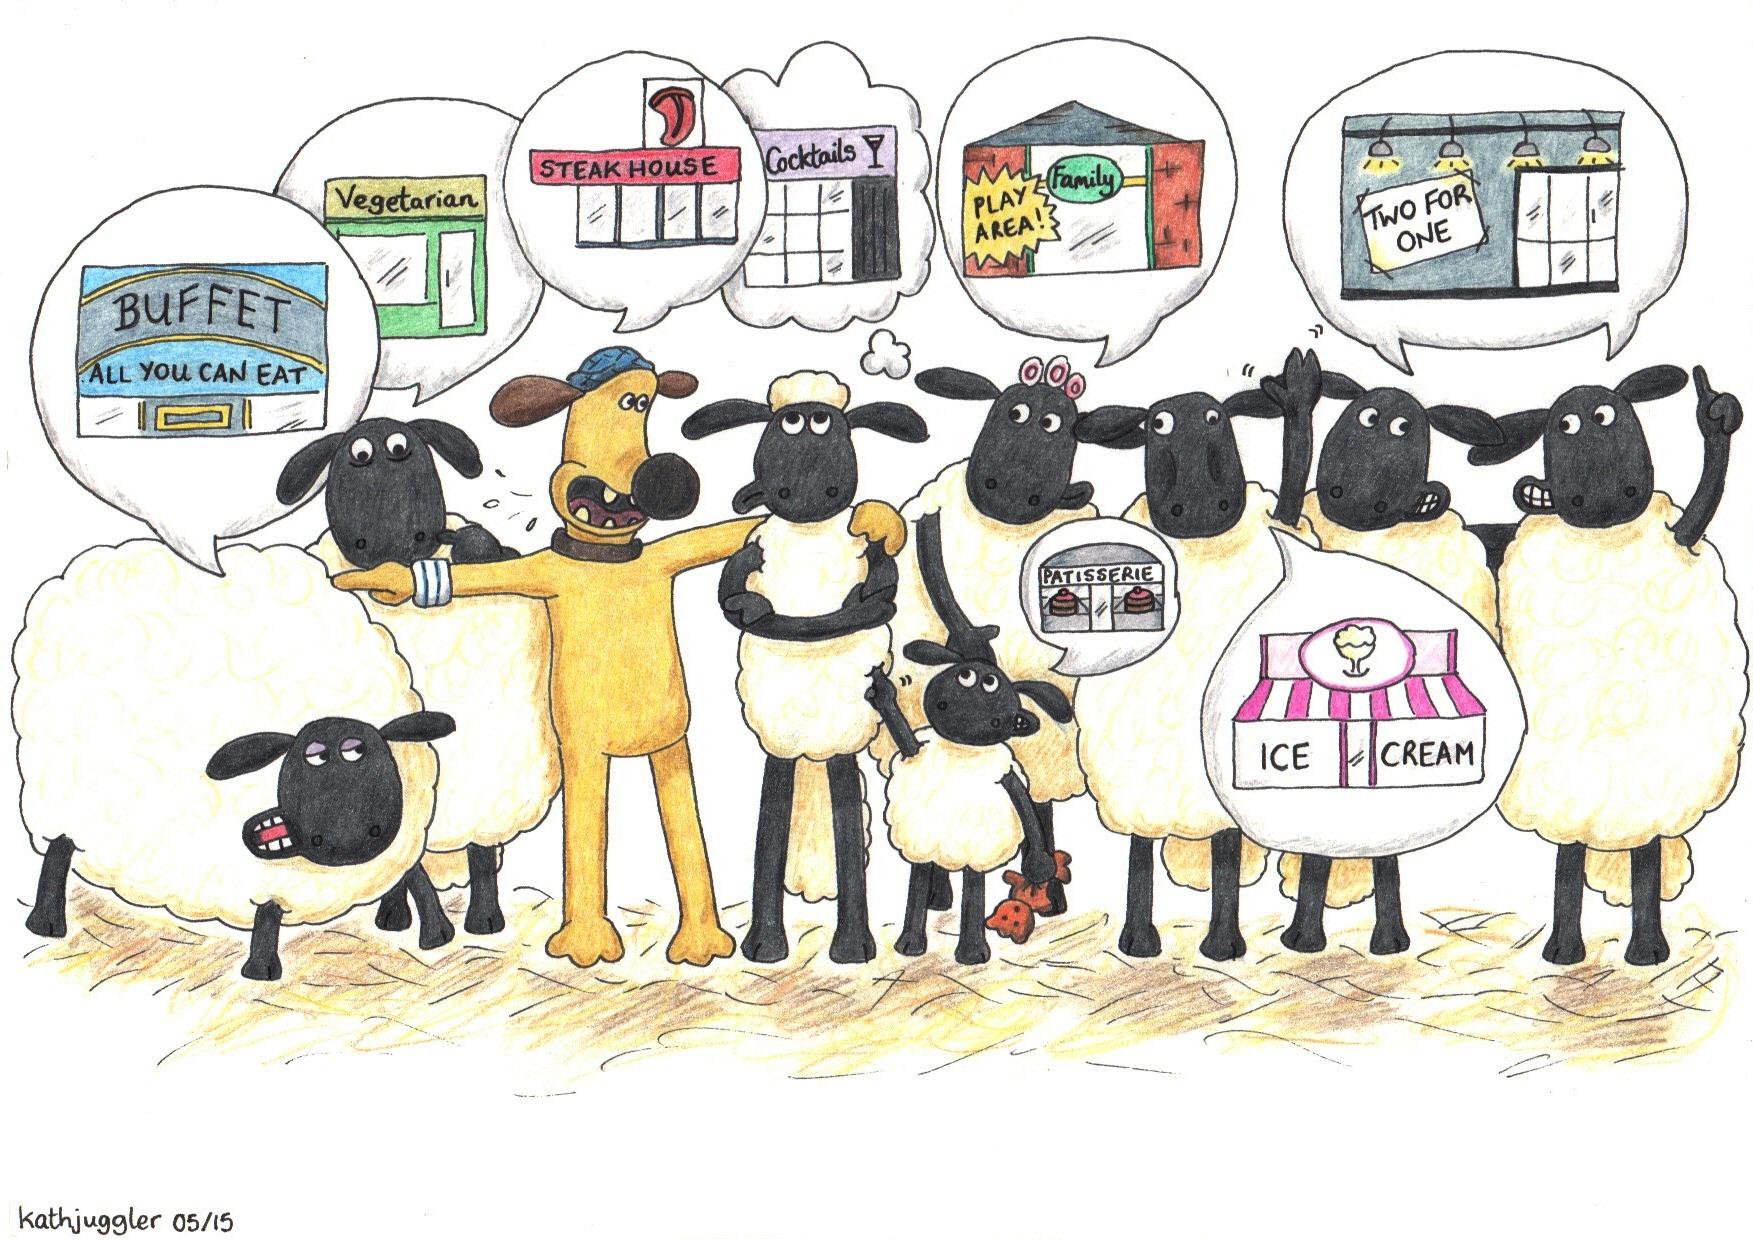 Colorful Shaun The Sheep Template Frieze - Resume Ideas - namanasa.com